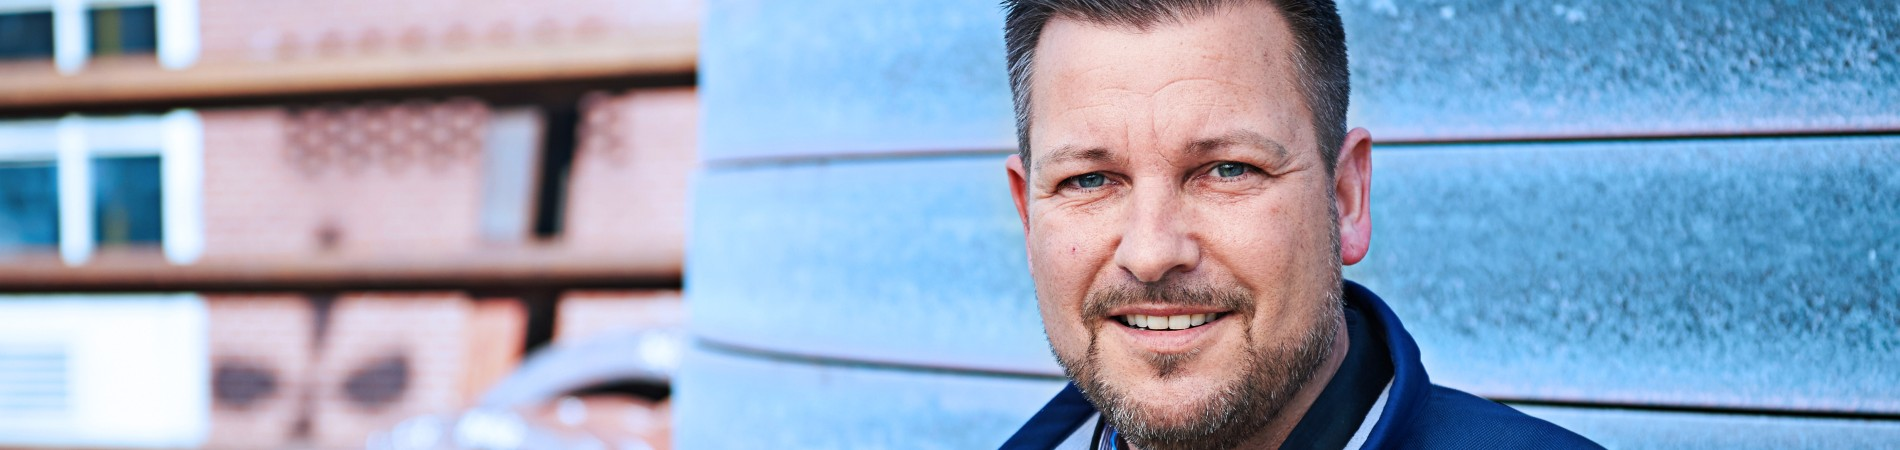 thyssenkrupp Bearings employee experience report Markus Bömeke